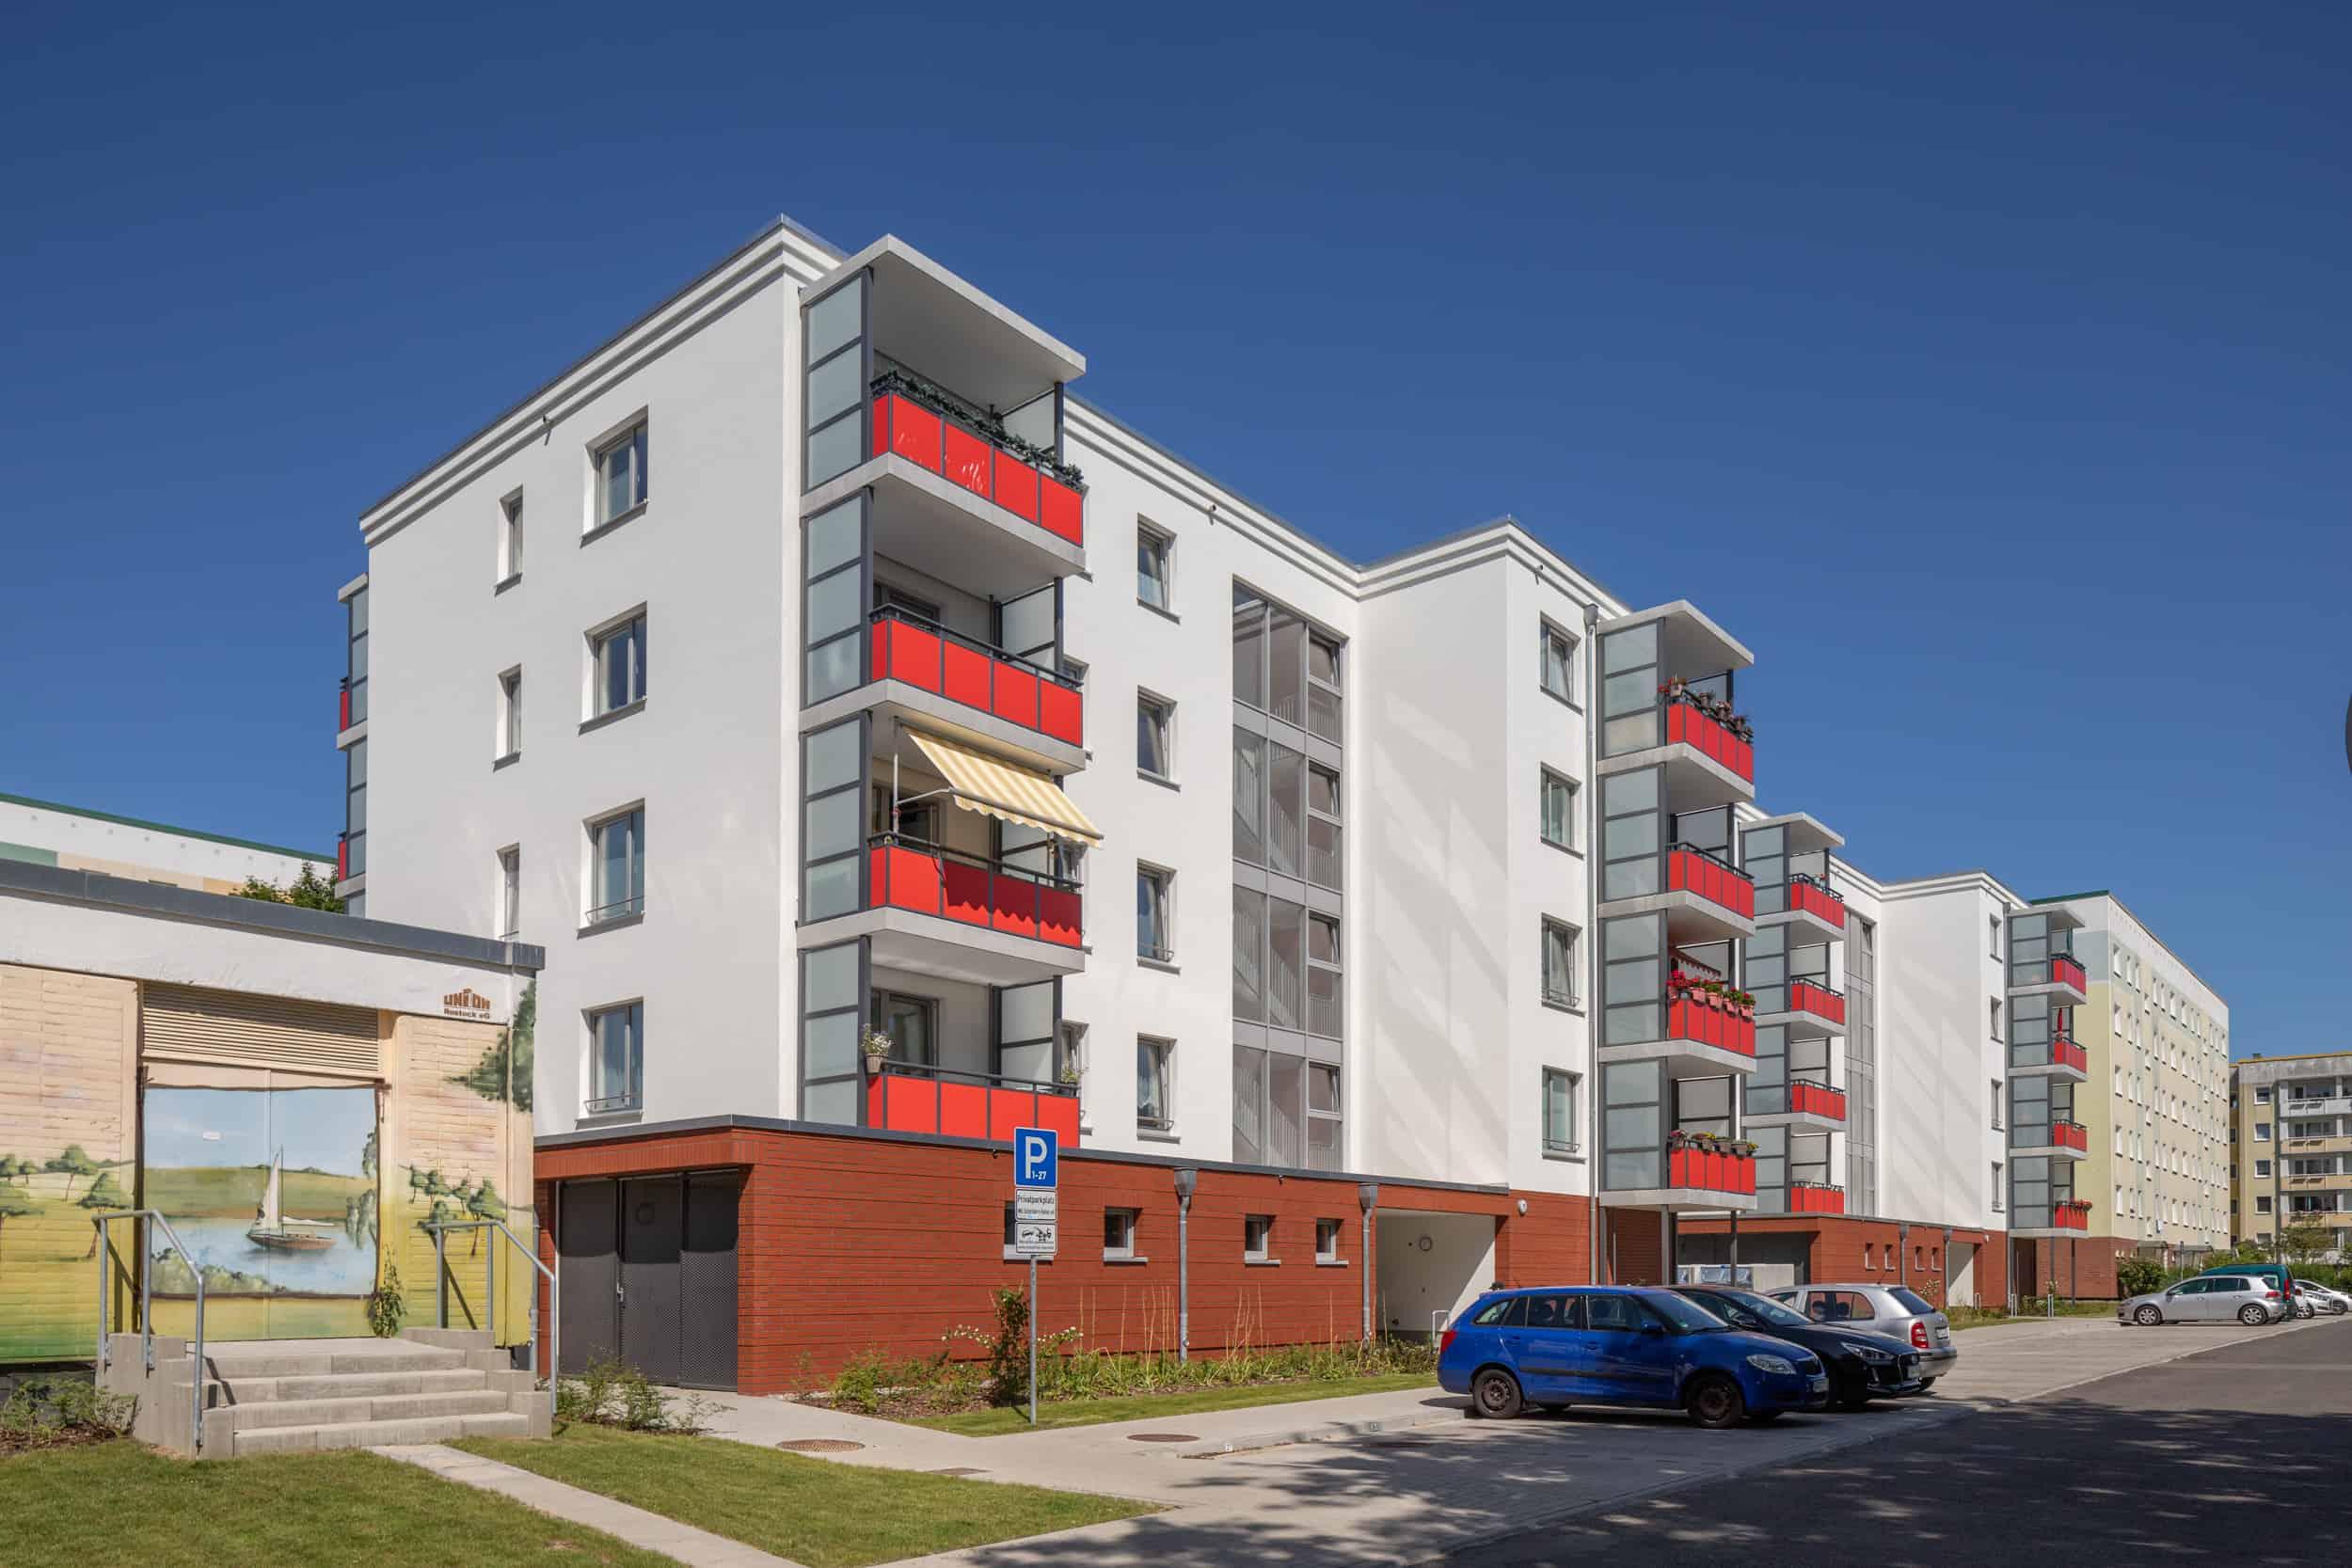 Sozialer Wohnungsbau in Rostock Schmarl - Vitus Bering Straße, Doppelbau